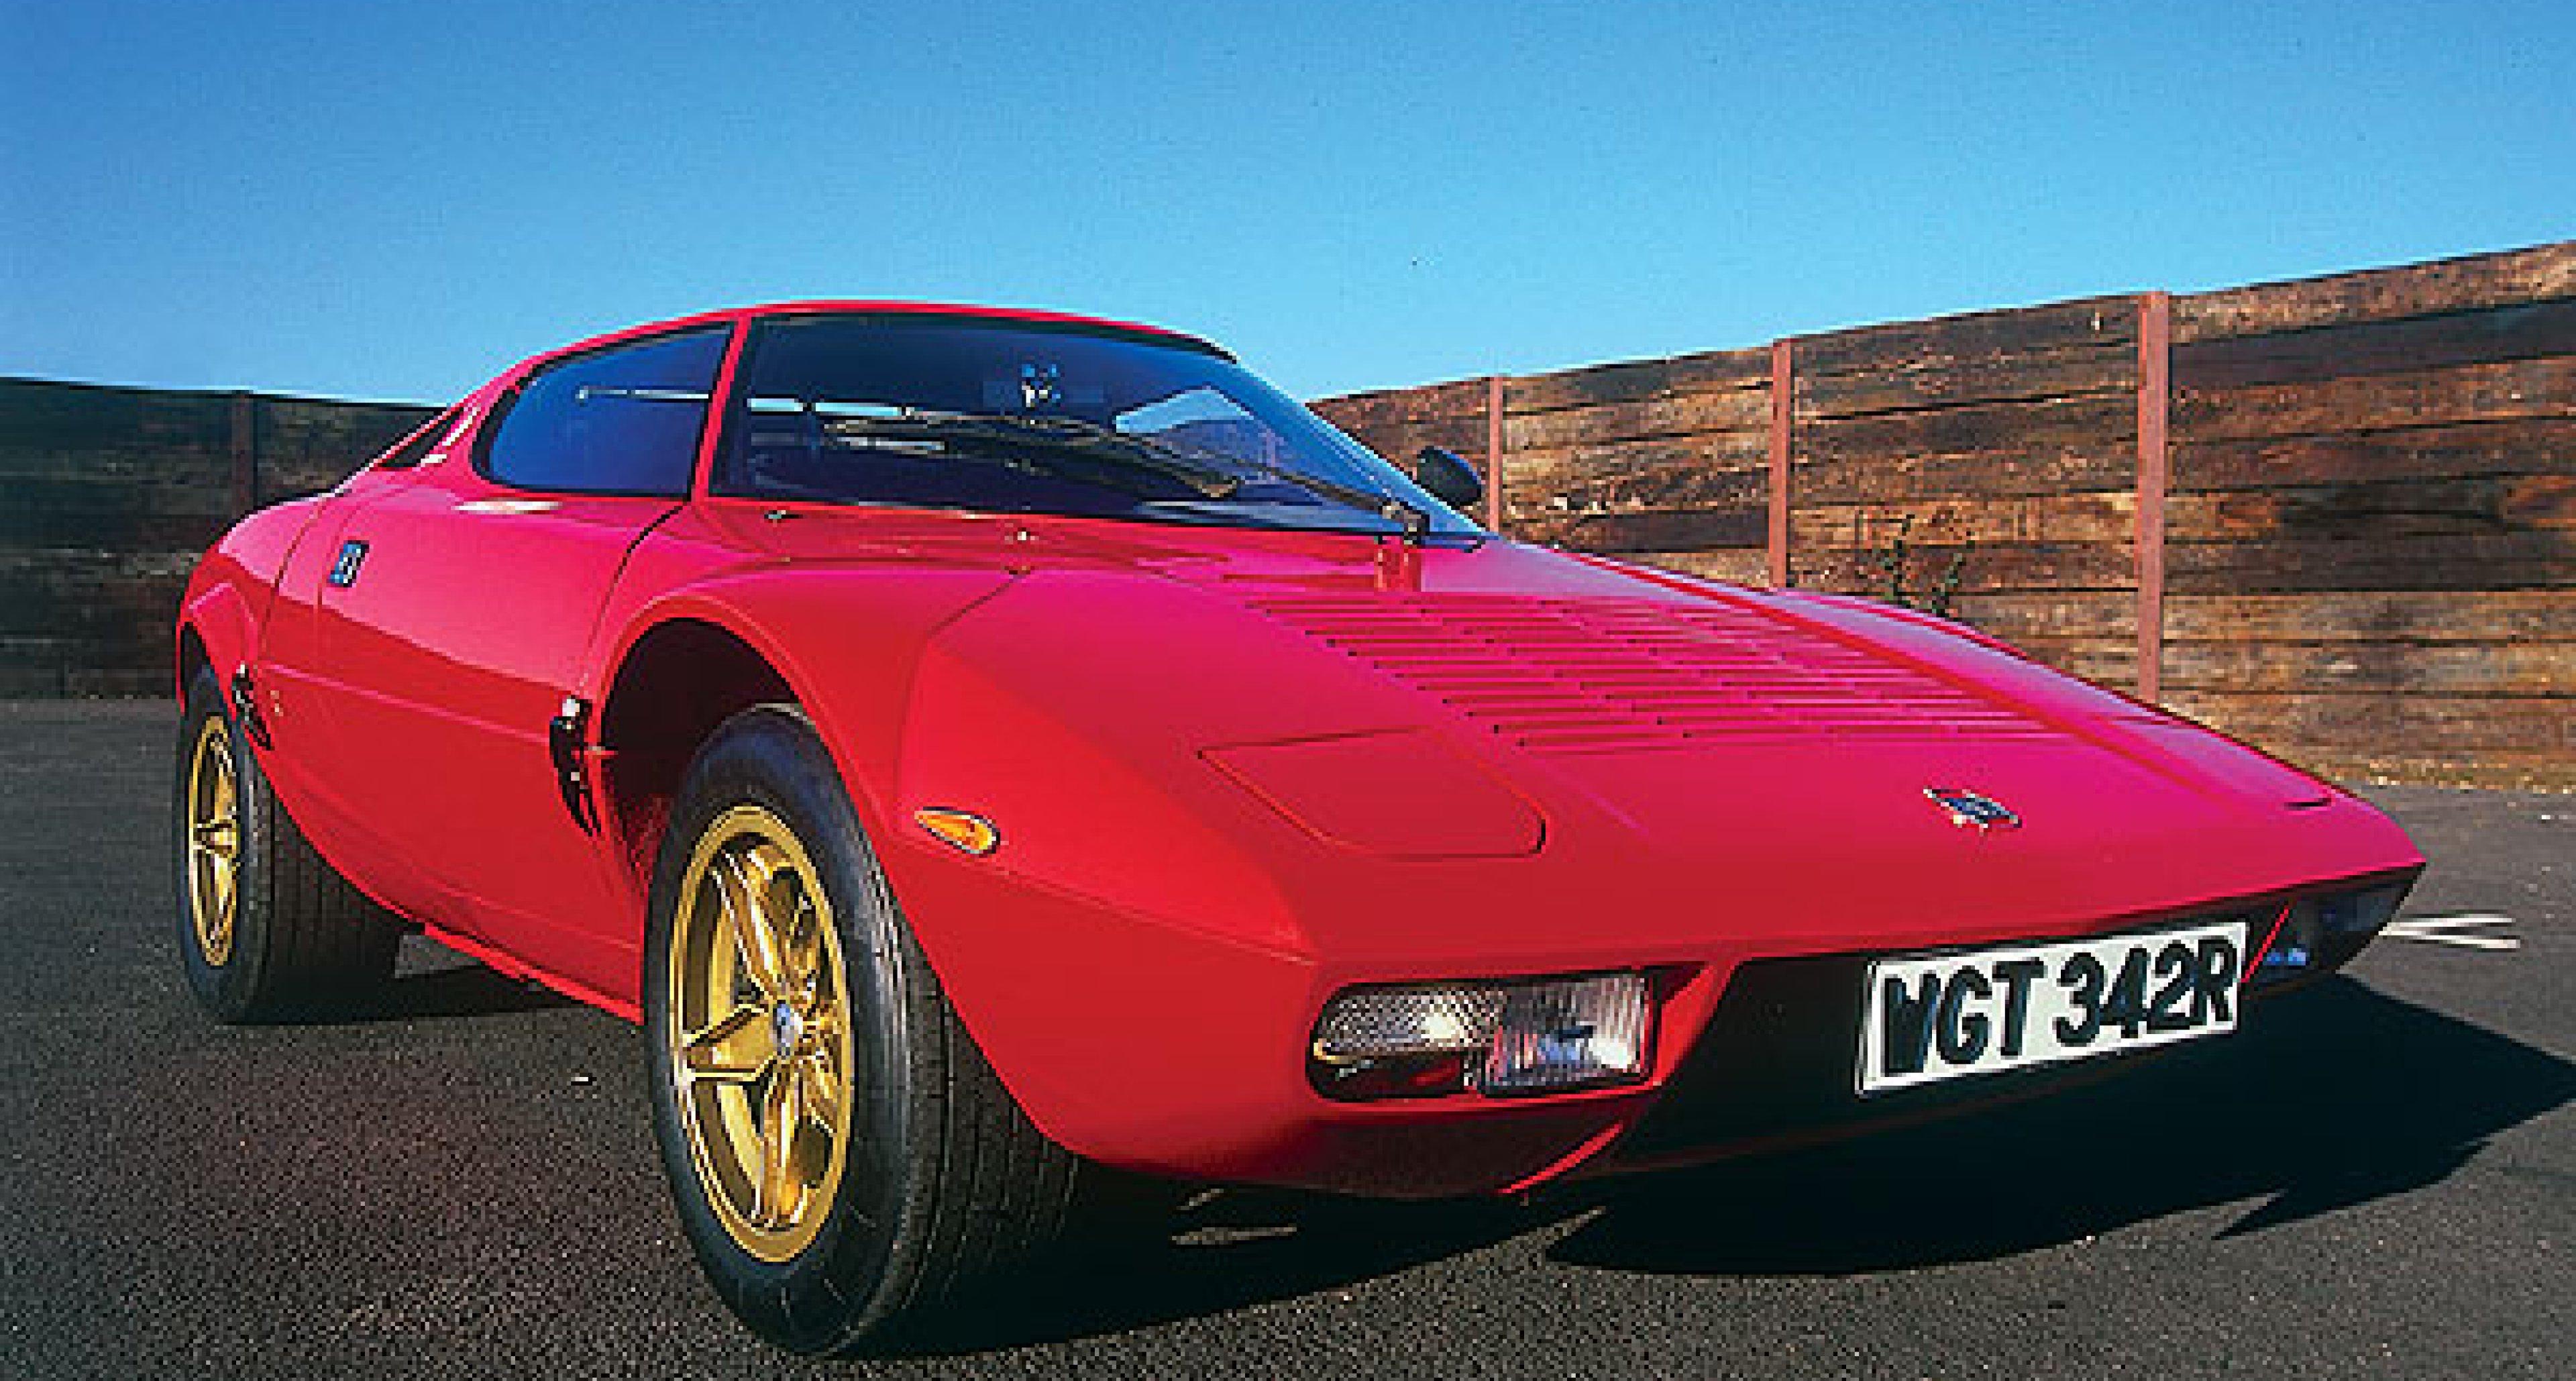 Lancia Stratos: Stradale vs Gruppe 4